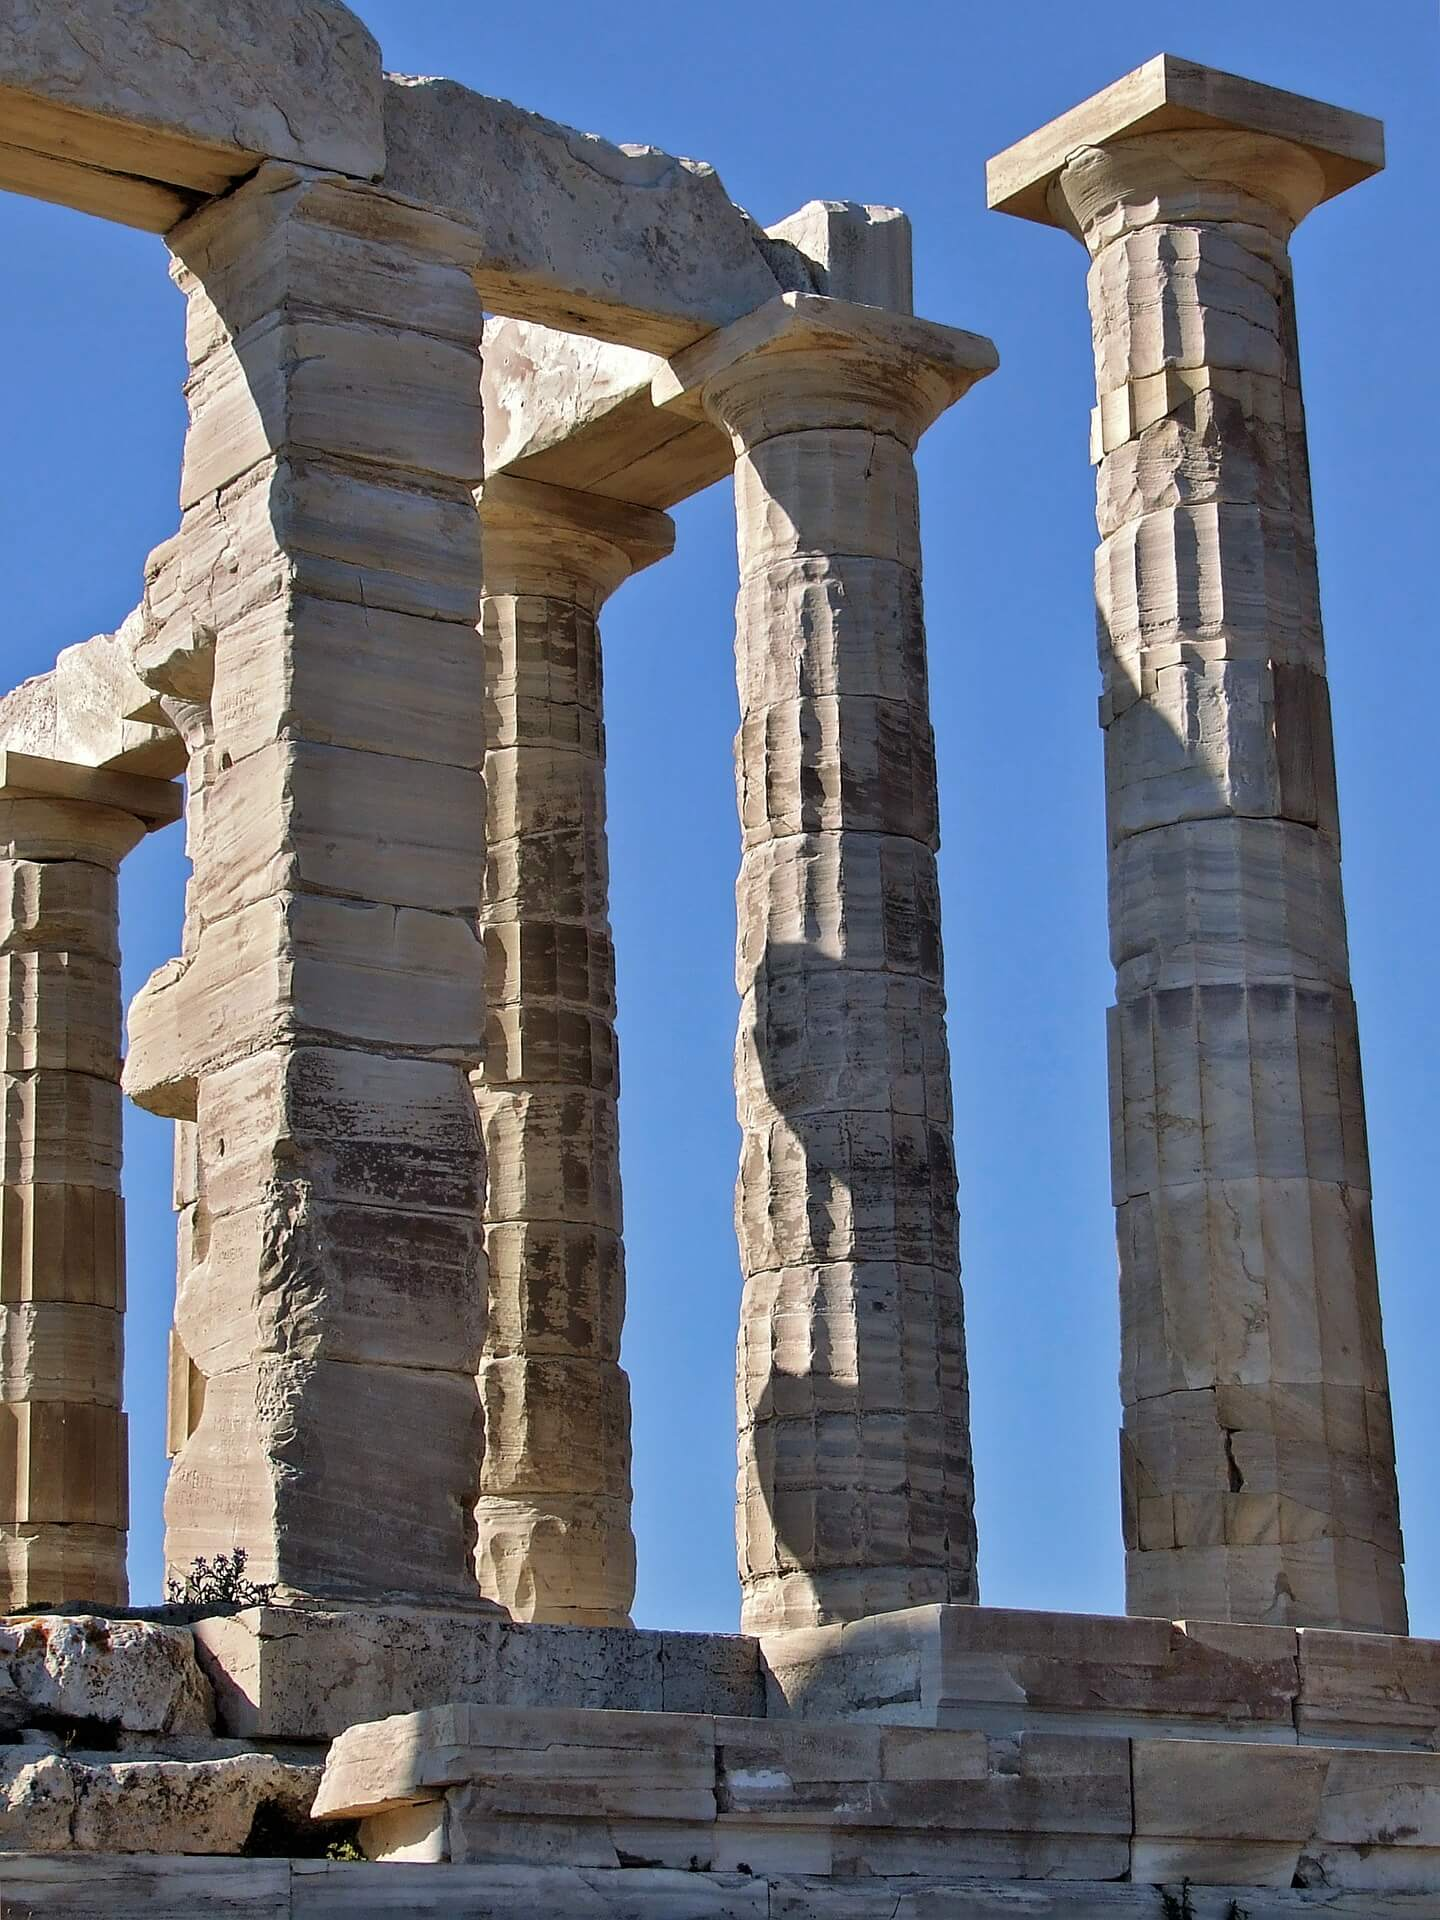 International Driving Permit in Greece 2